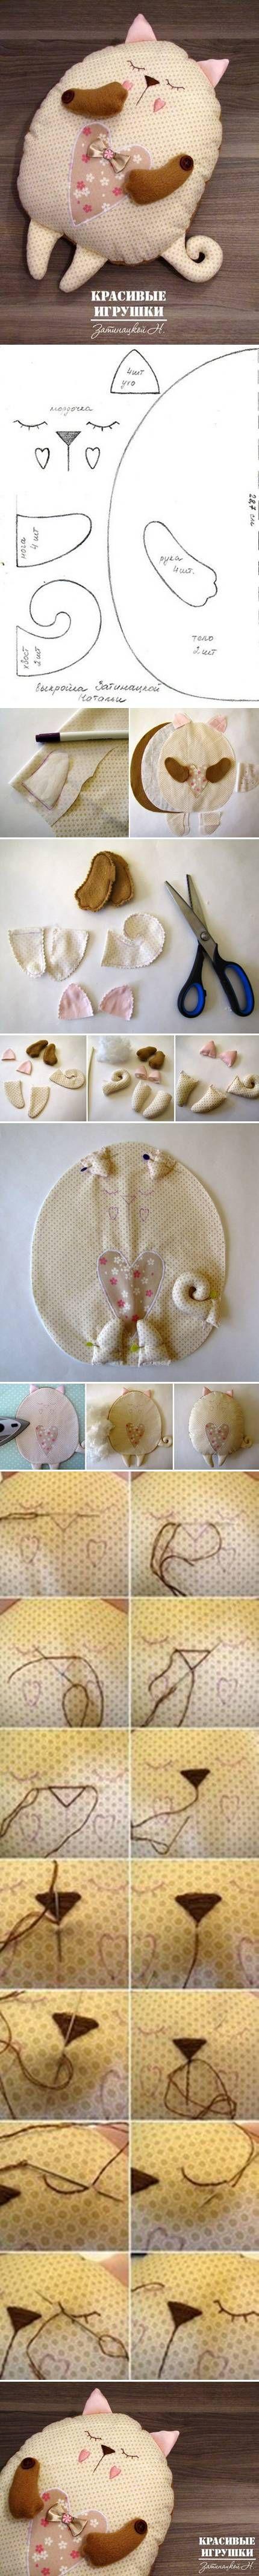 DIY Soft Sew Fabric Cat